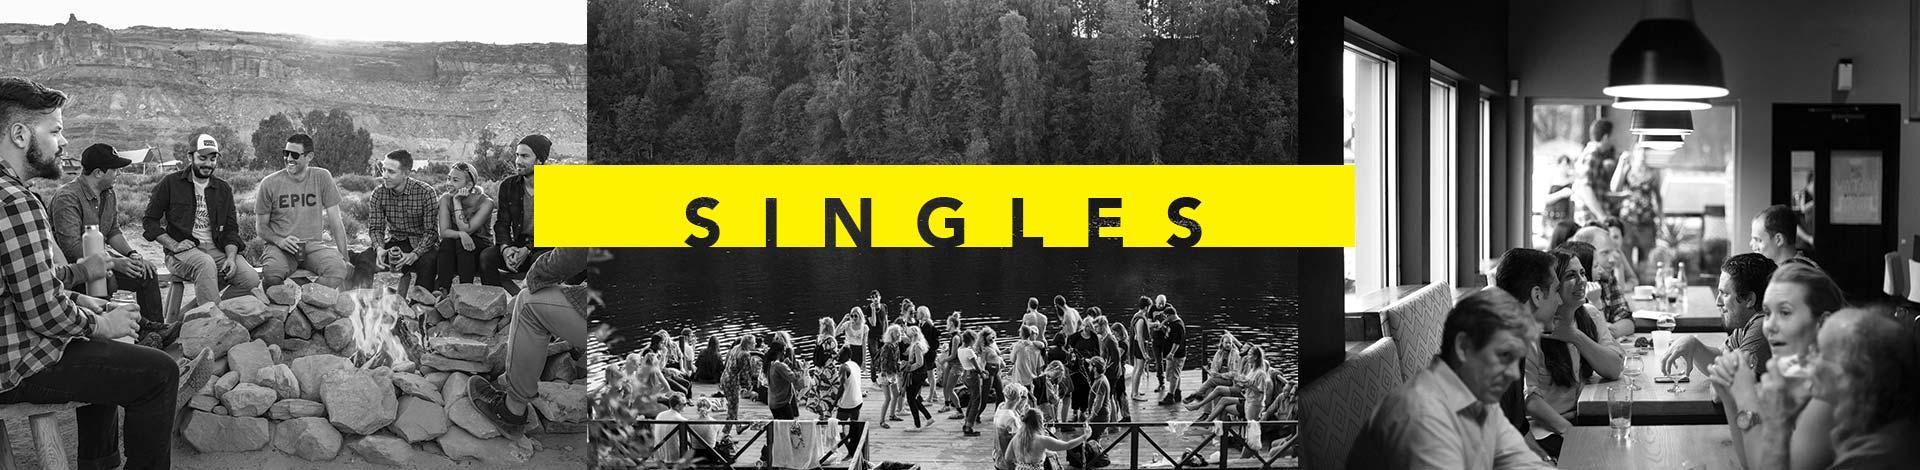 christian singles events phoenix